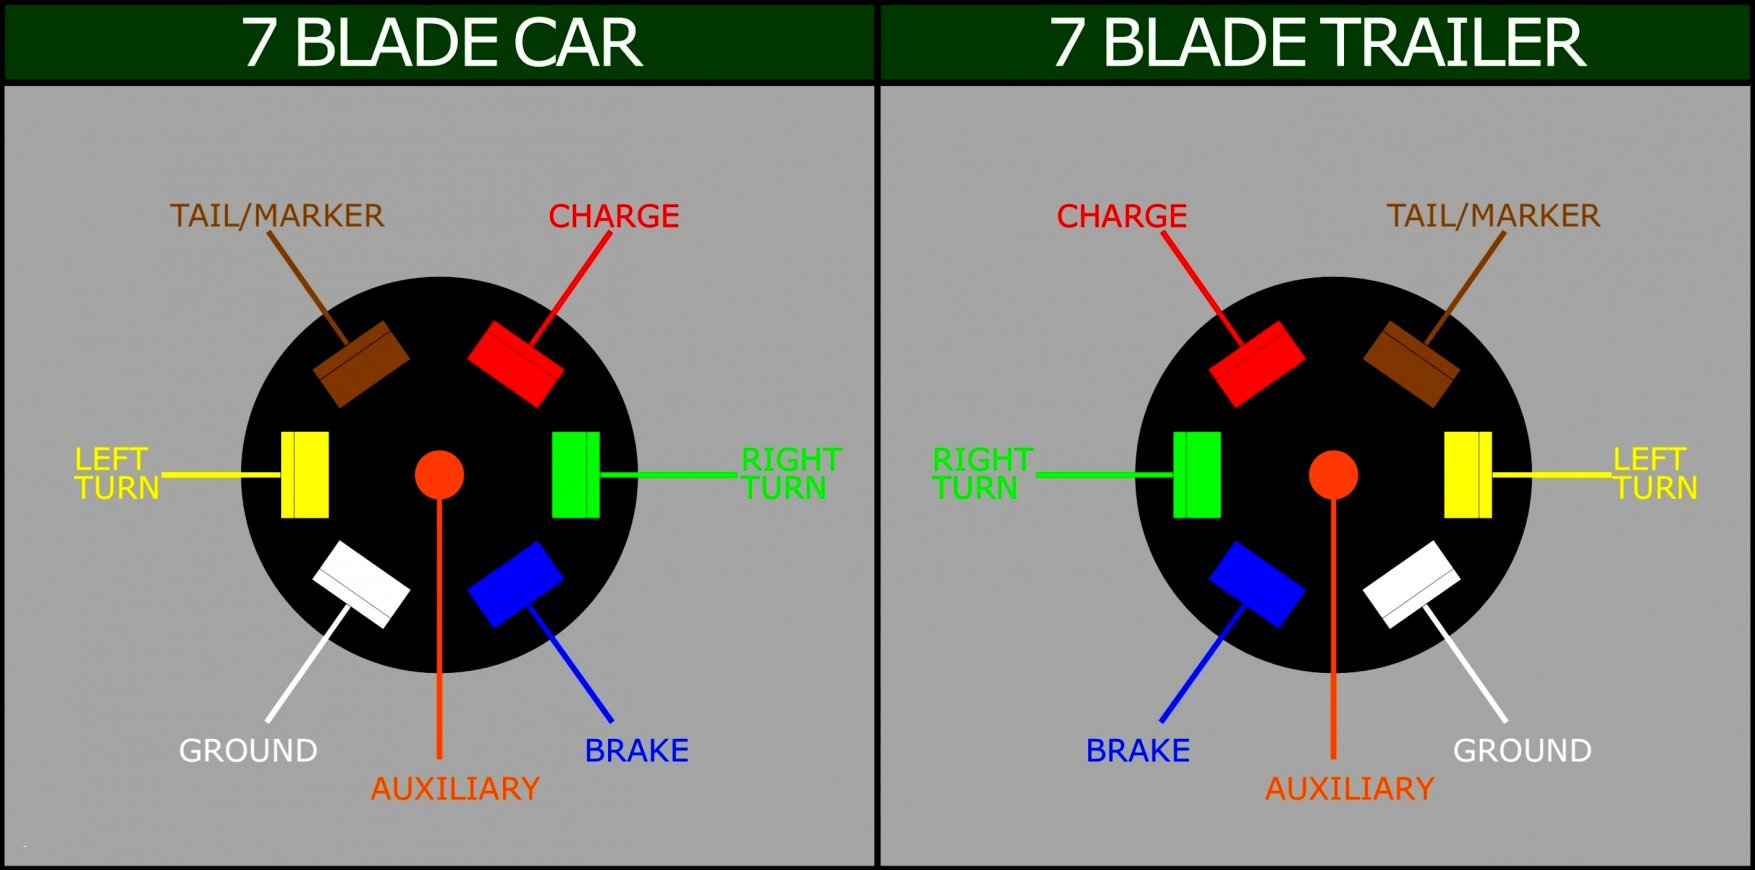 Pollak 12 705 Trailer Plug Wiring Diagram   Wiring Diagram - Pollak Trailer Plug Wiring Diagram